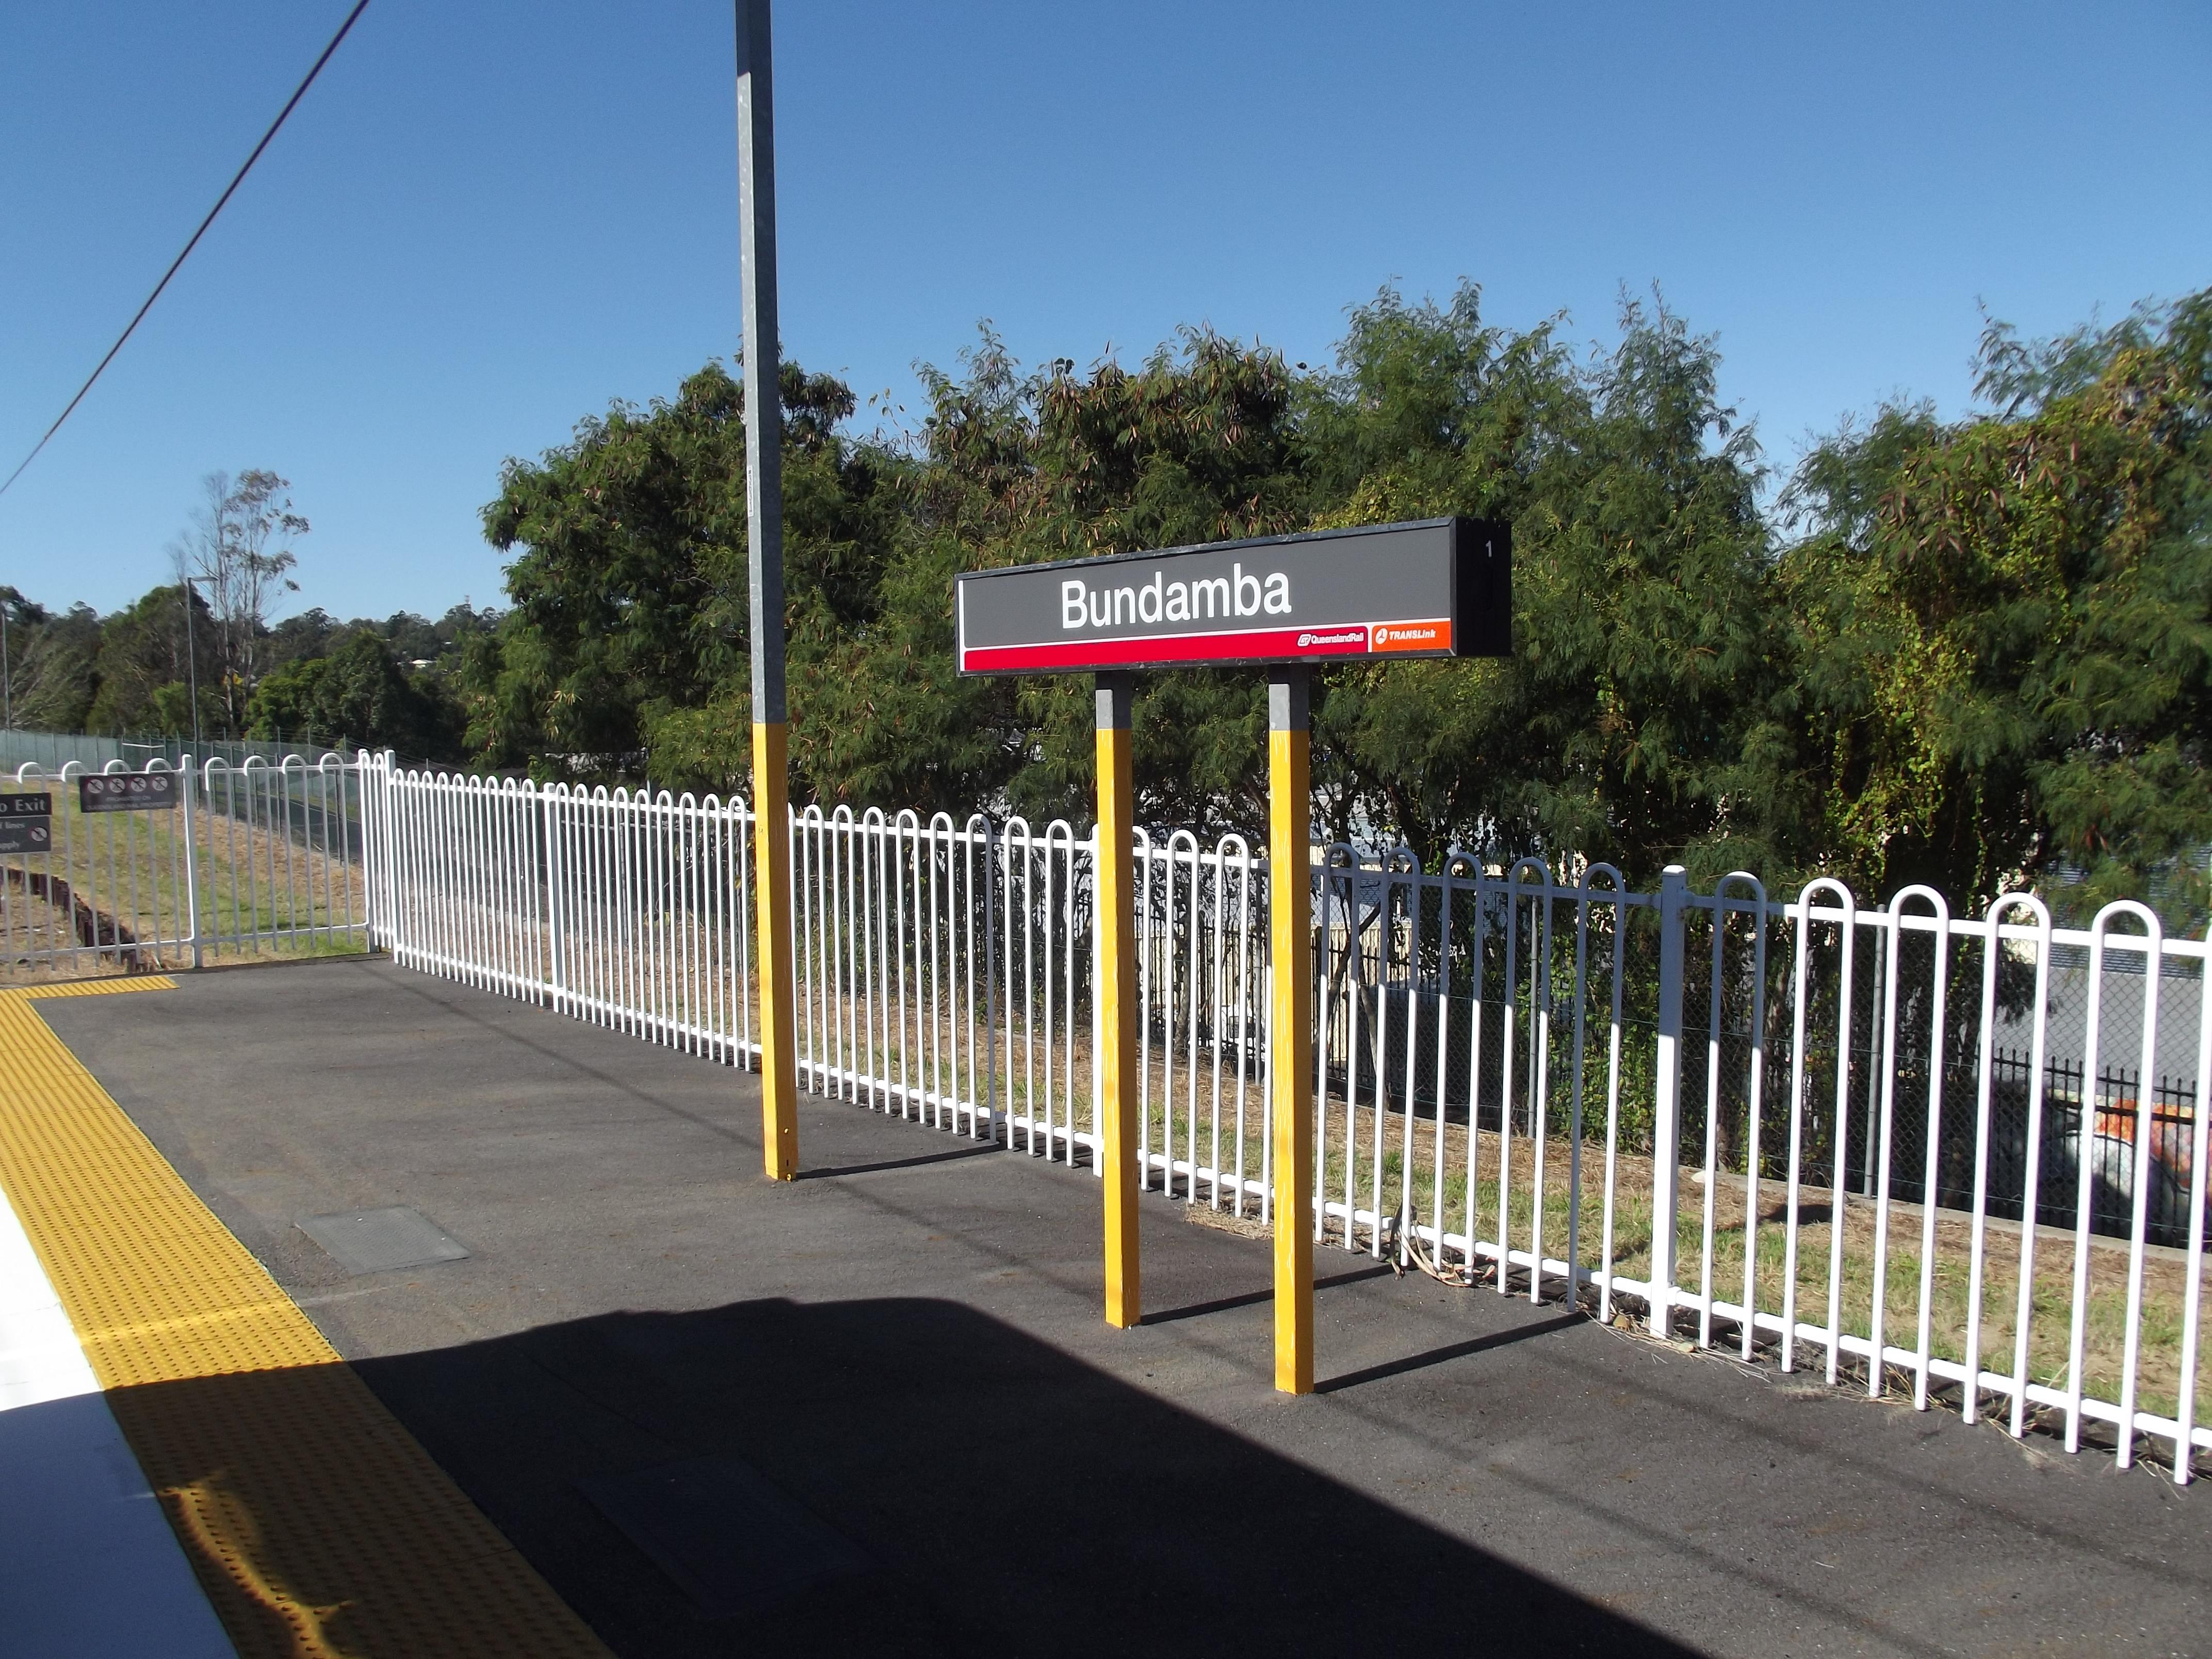 File:Bundamba Railway Station, Queensland, May 2012.JPG ...